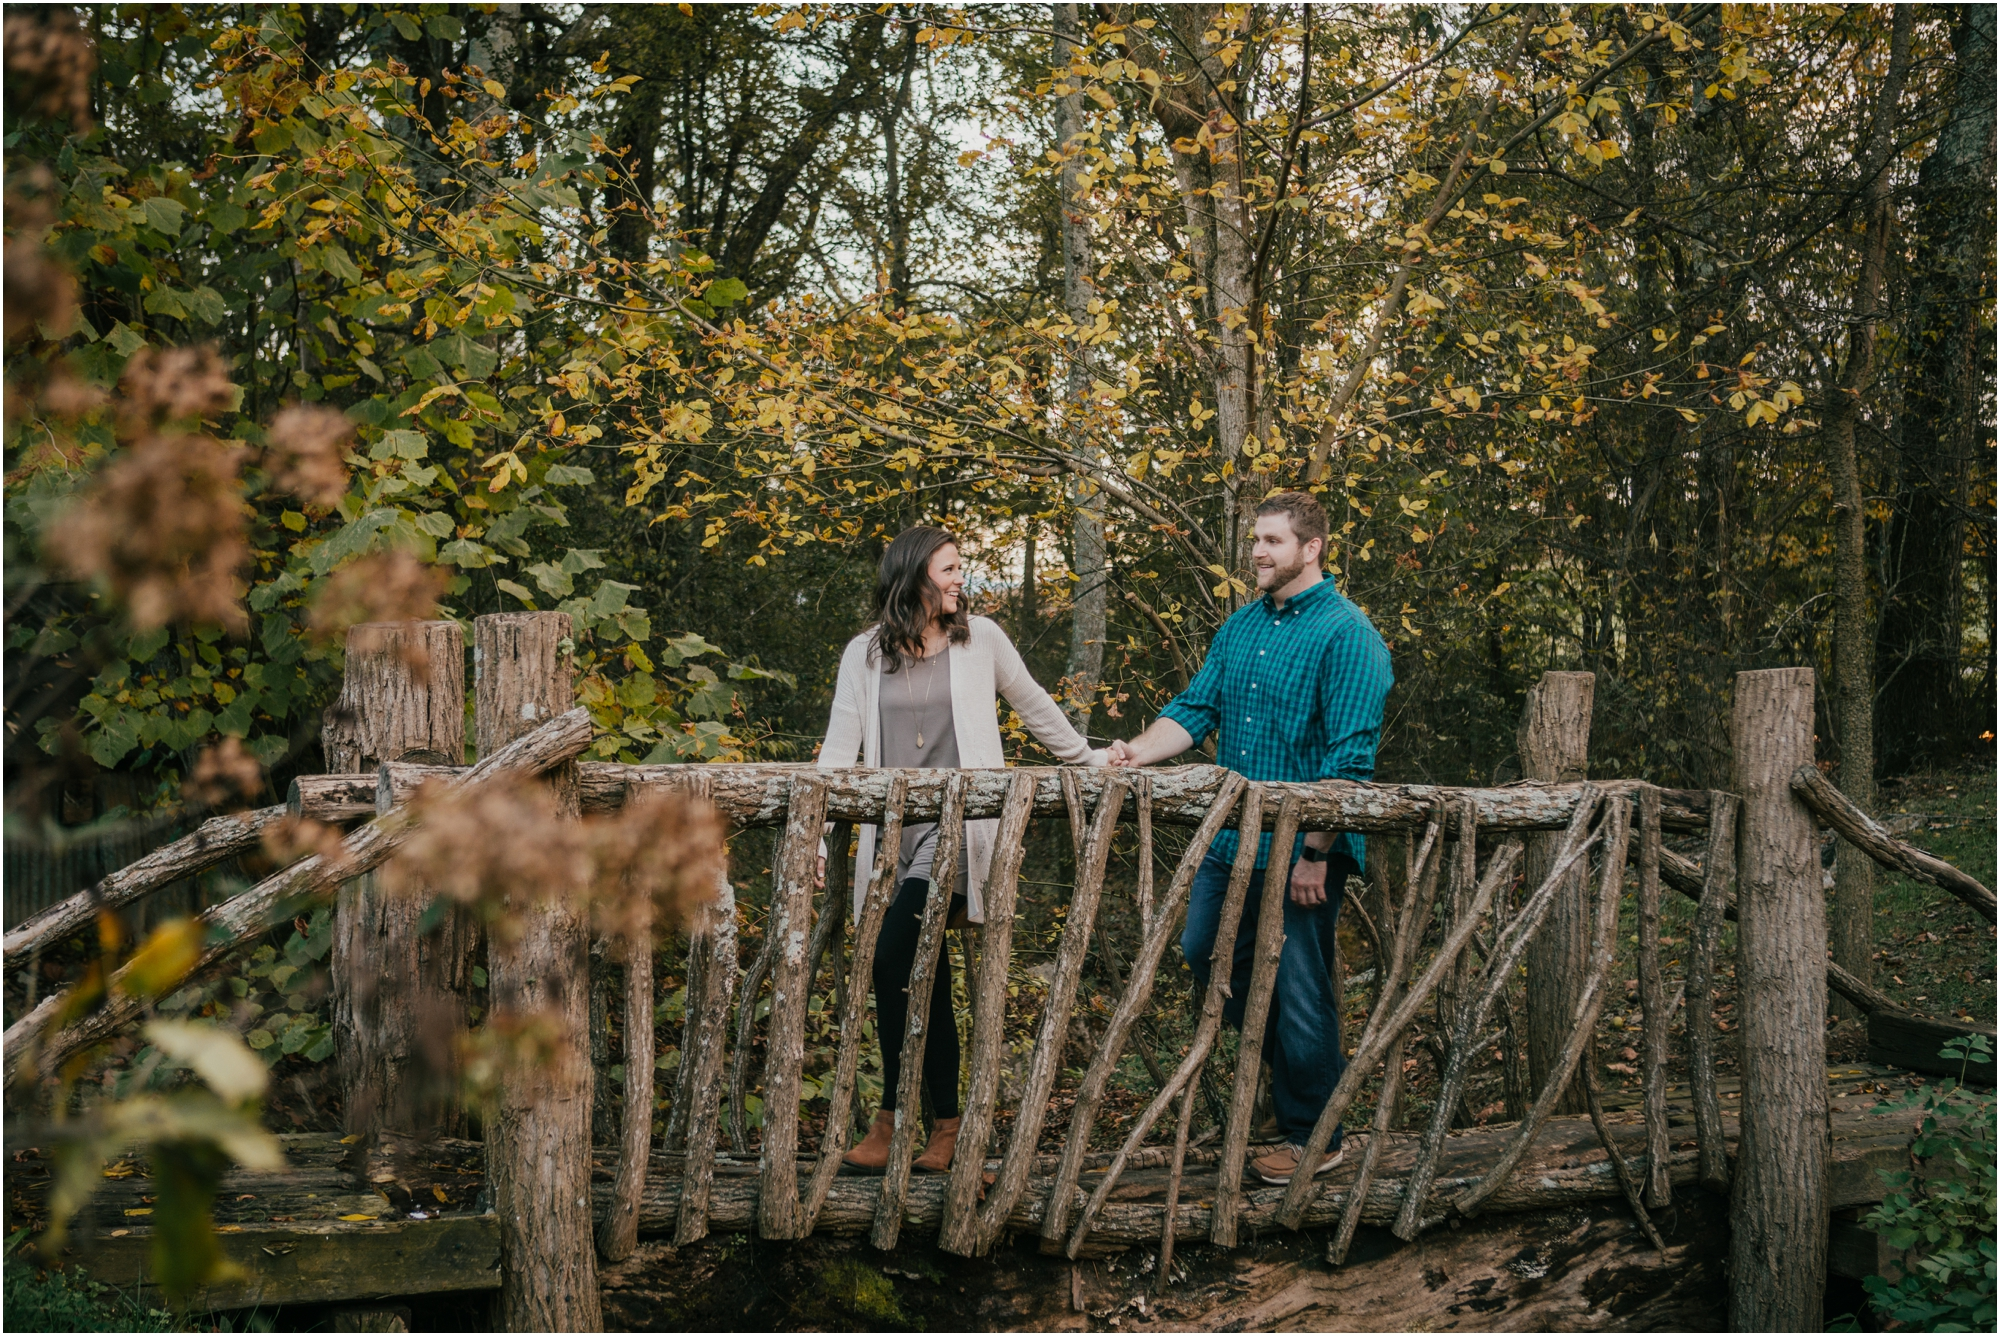 katy-sergent-millstone-limestone-tn-rustic-fall-engagement-session-adventurous-outdoors-intimate-elopement-wedding-northeast-johnson-city-photographer_0017.jpg